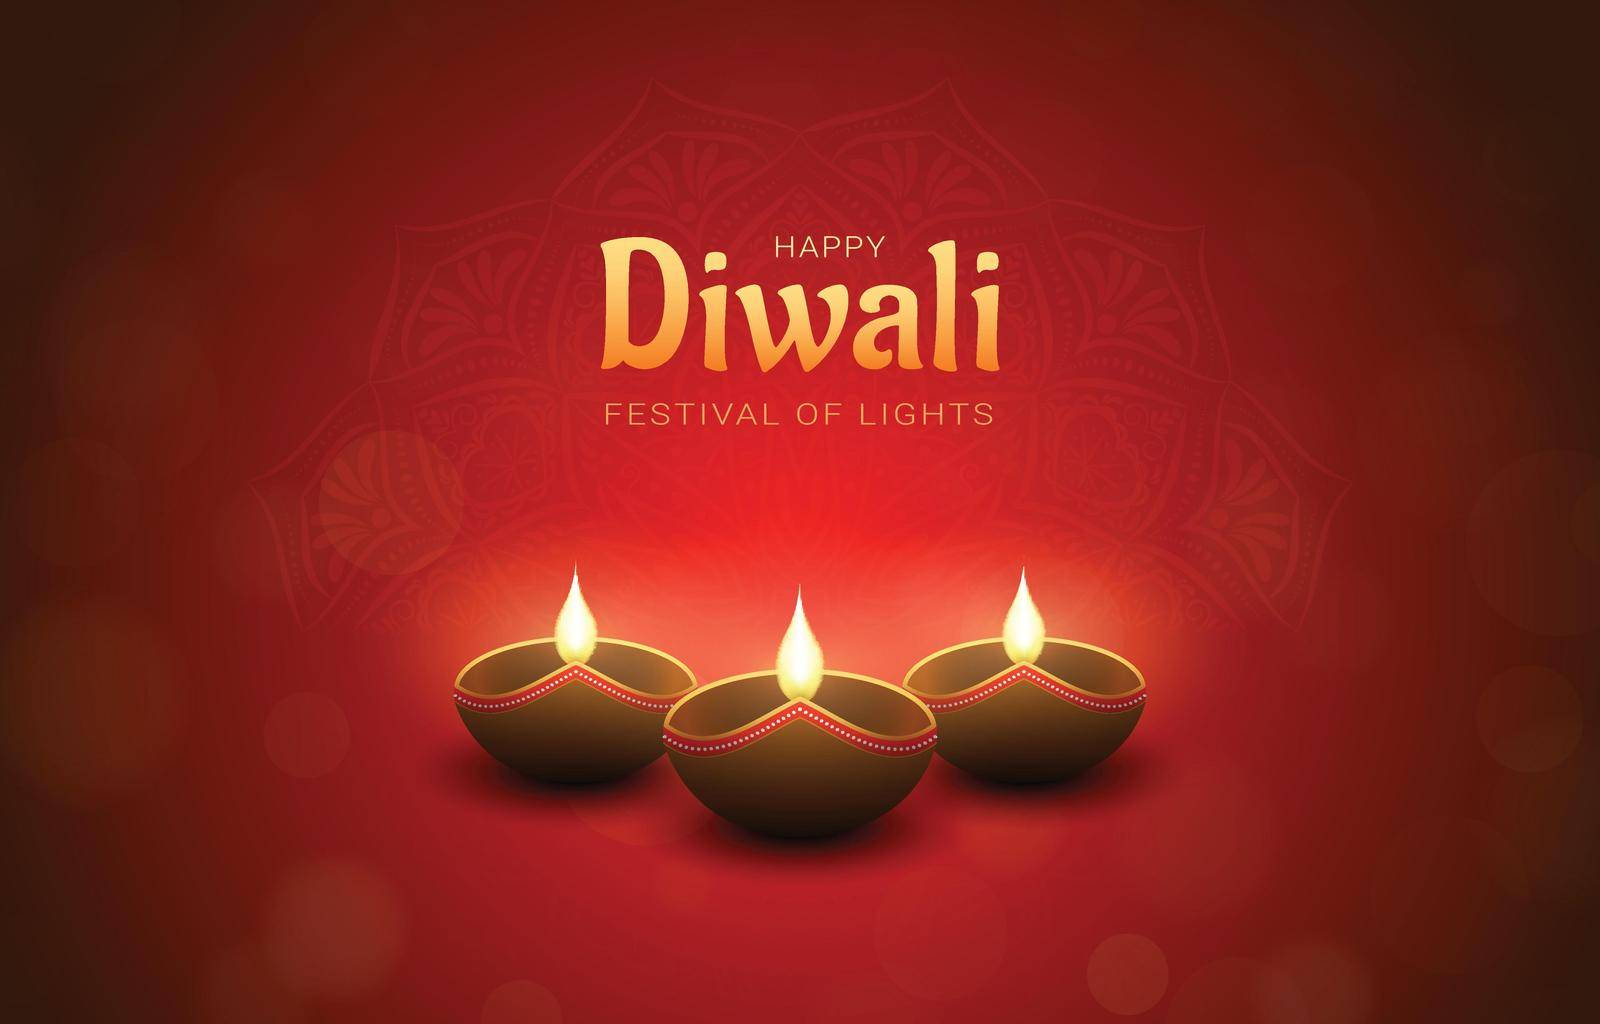 Red Happy Diwali design with burning diya lamps, bokeh and mandala effect. Festival of lights concept.